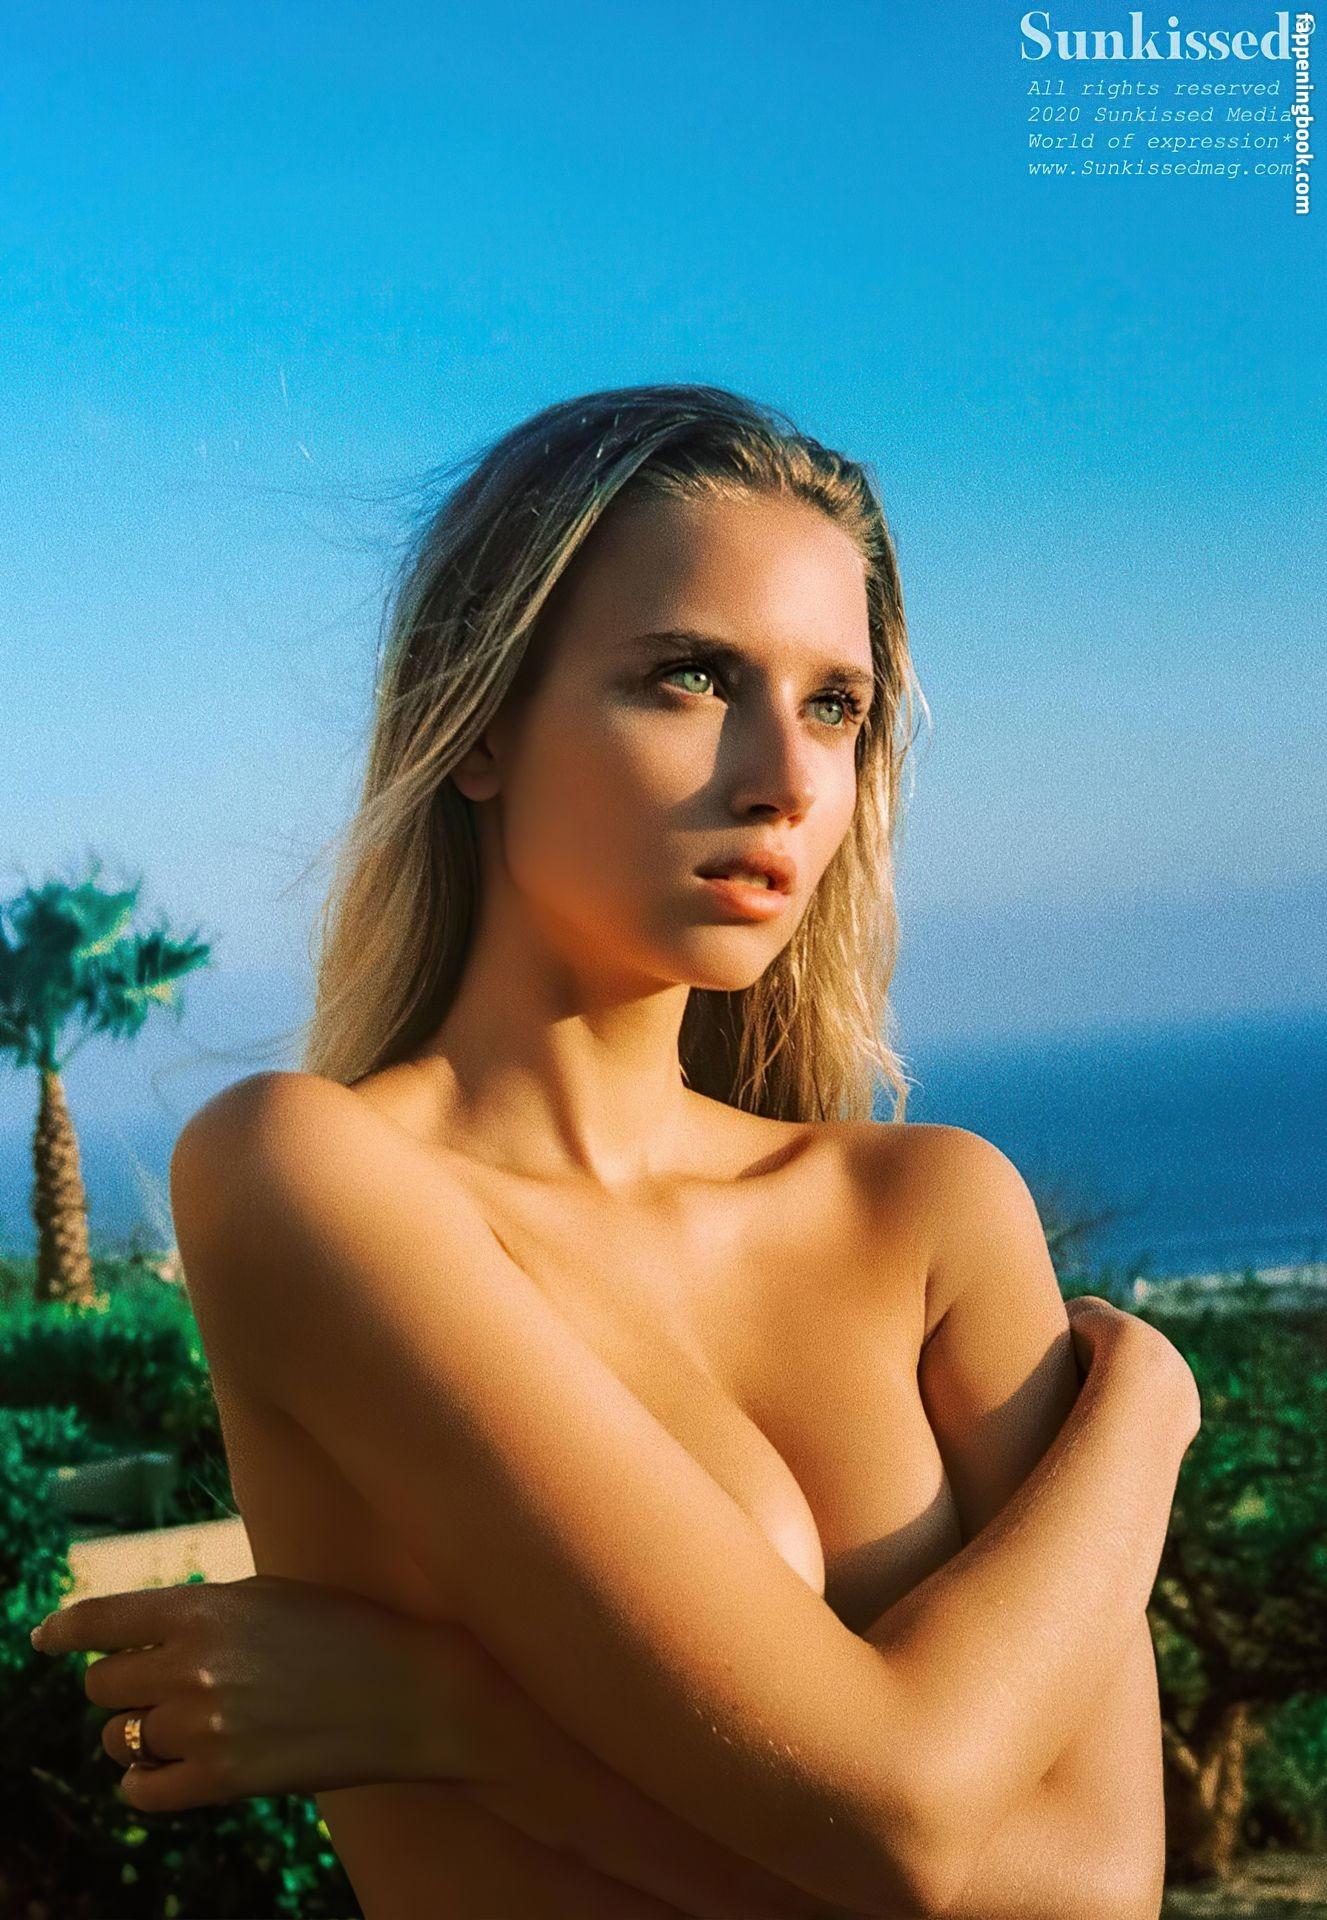 Polina Malinovskaya Nude, Sexy, The Fappening, Uncensored